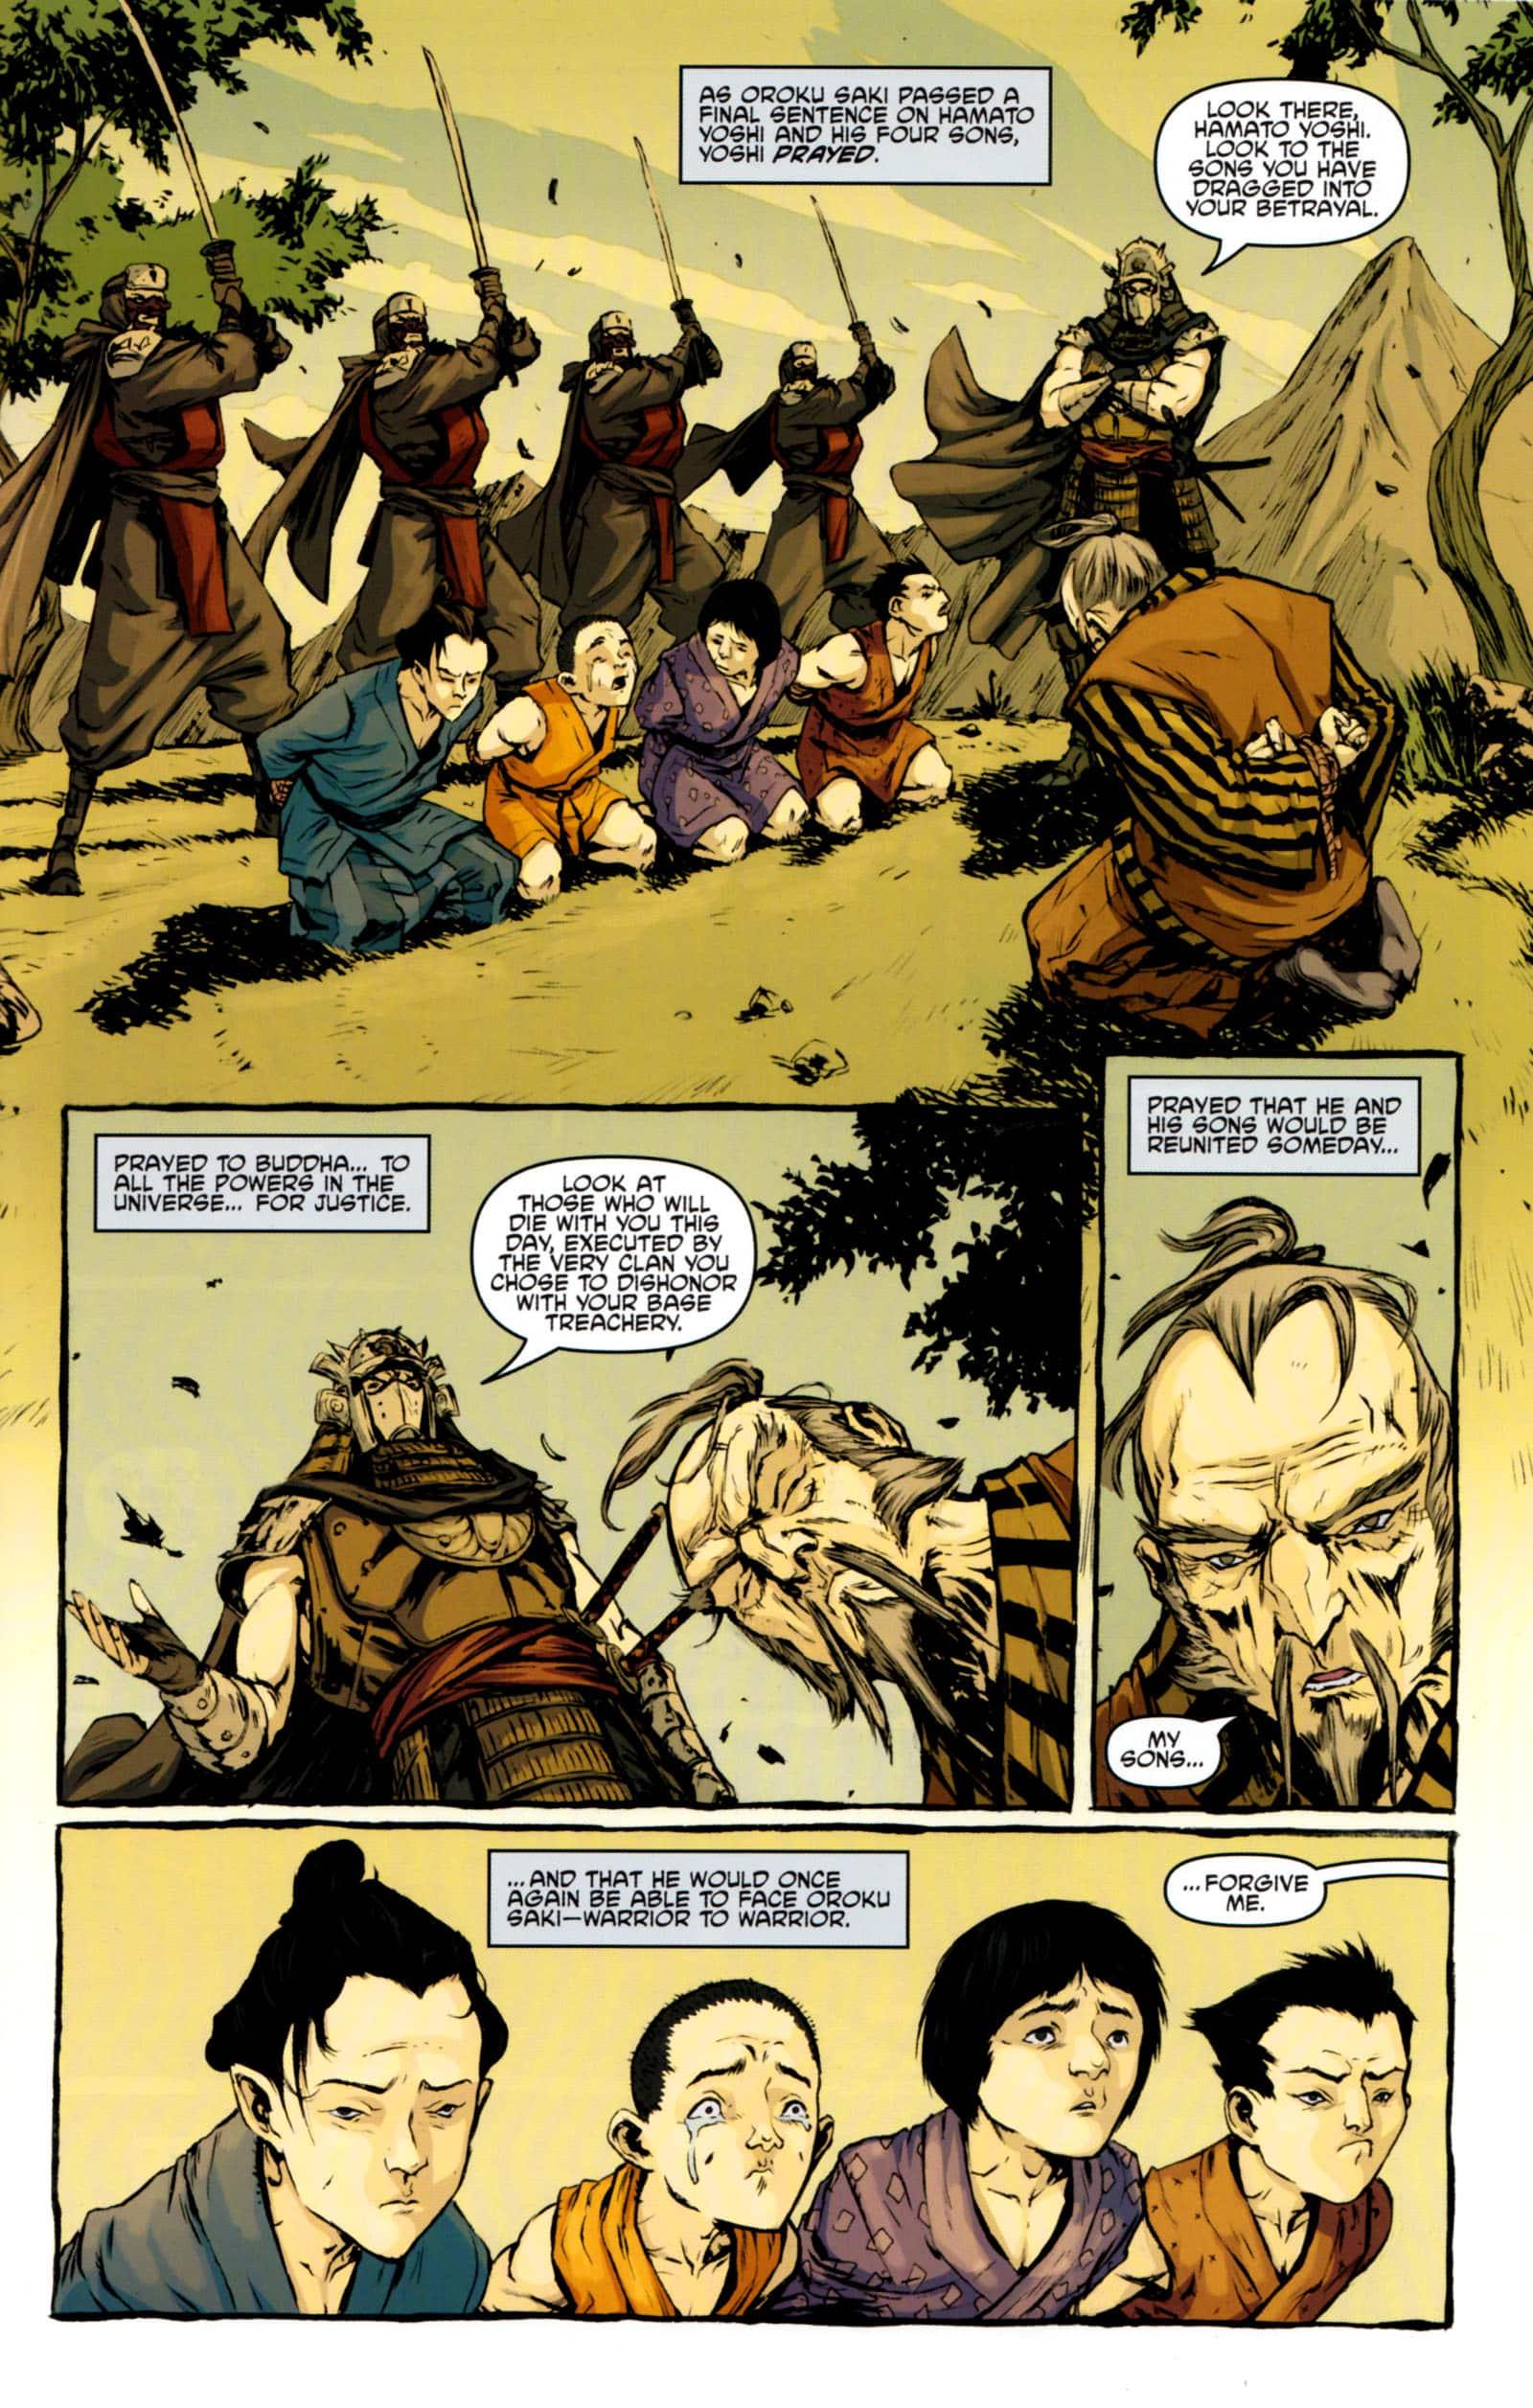 totrtugas ninja de idw #5